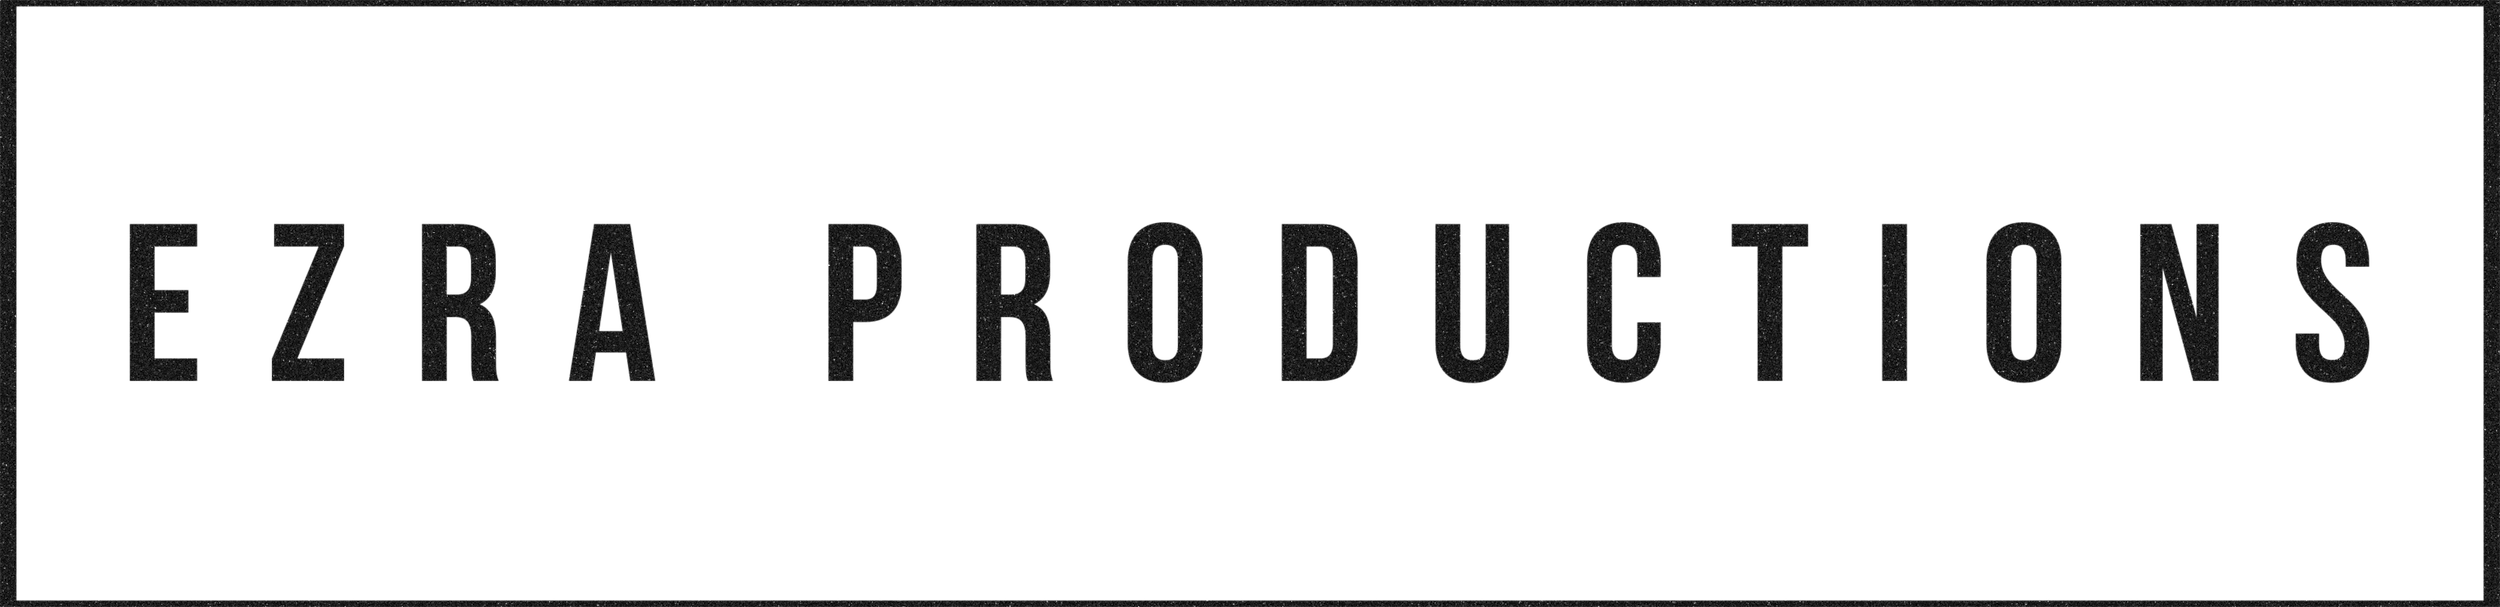 Ezra Productions